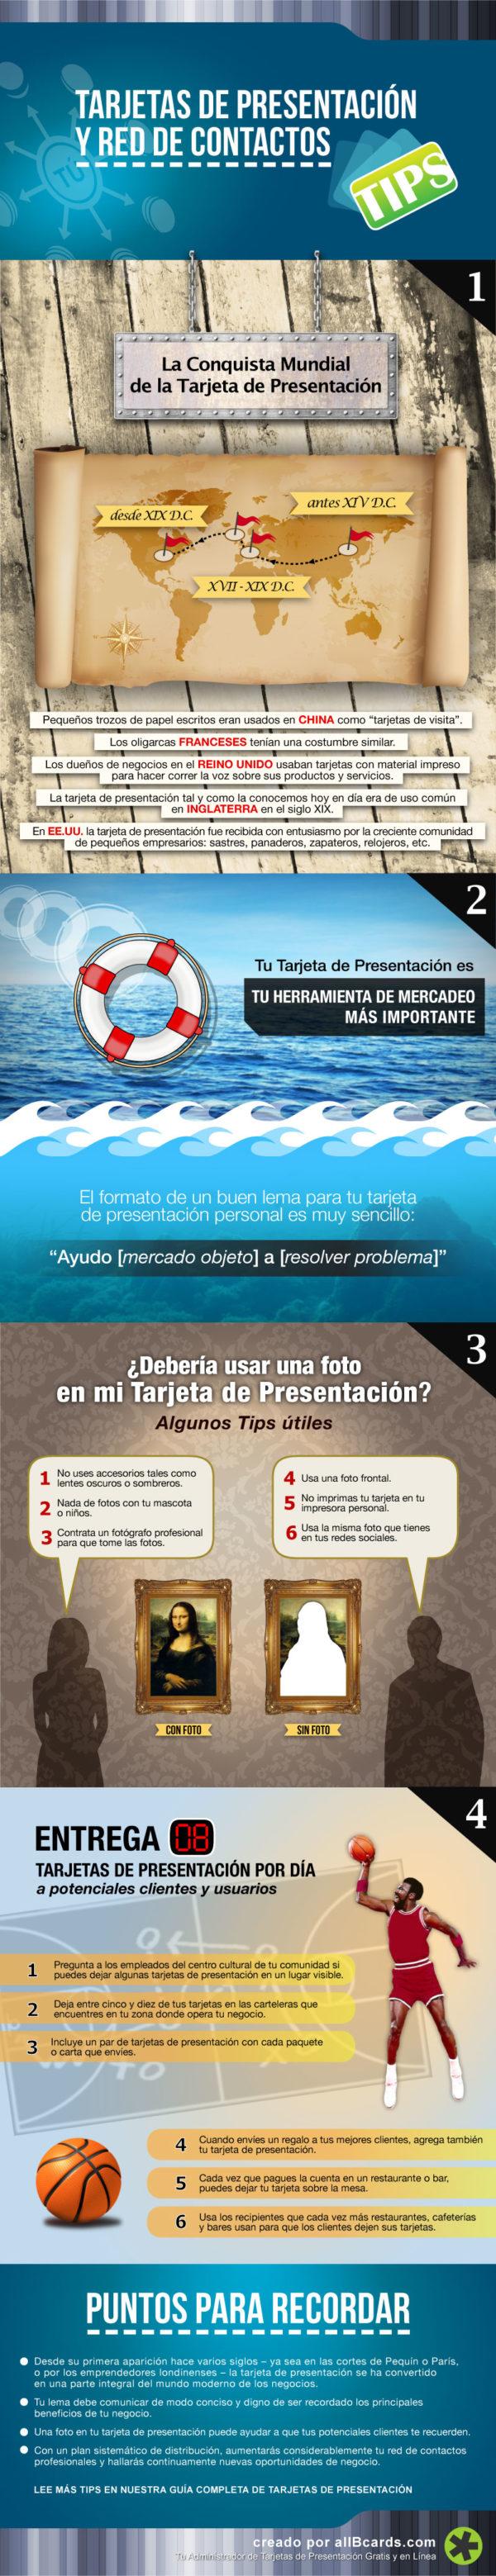 infografia allbcards